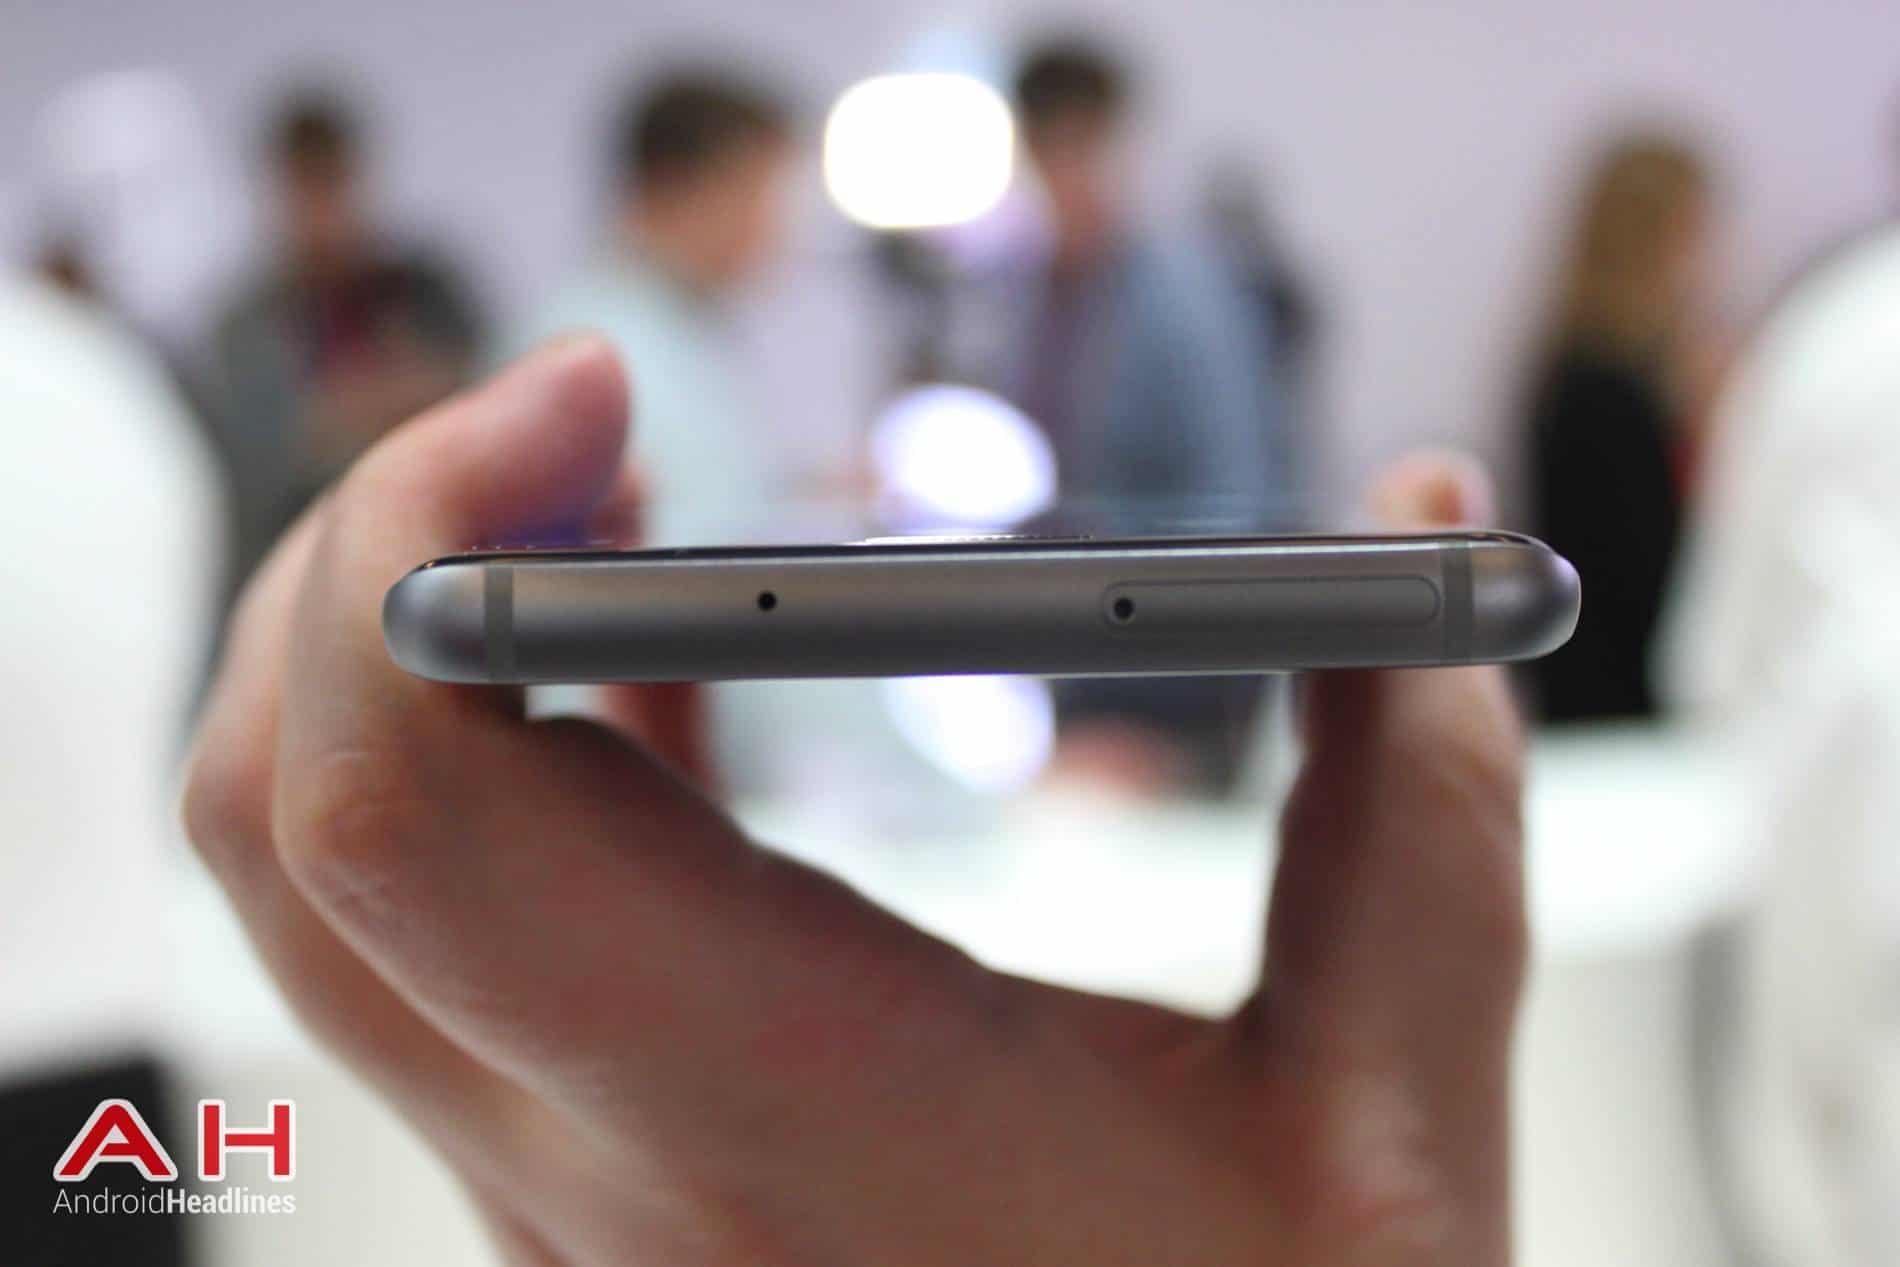 Galaxy S7 Edge MWC AH 14